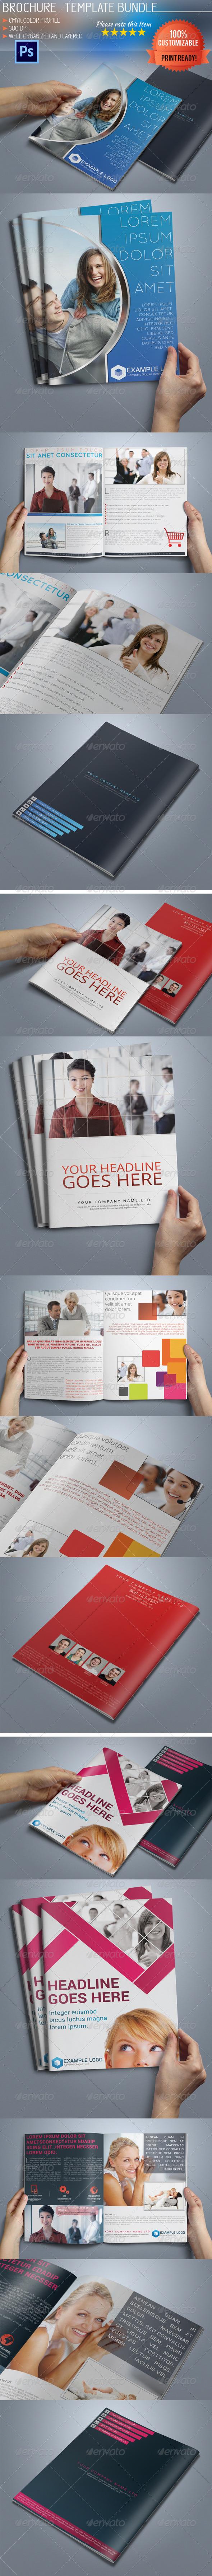 GraphicRiver Multipurpose Bi-Fold Business Brochure Bundle 02 5229318